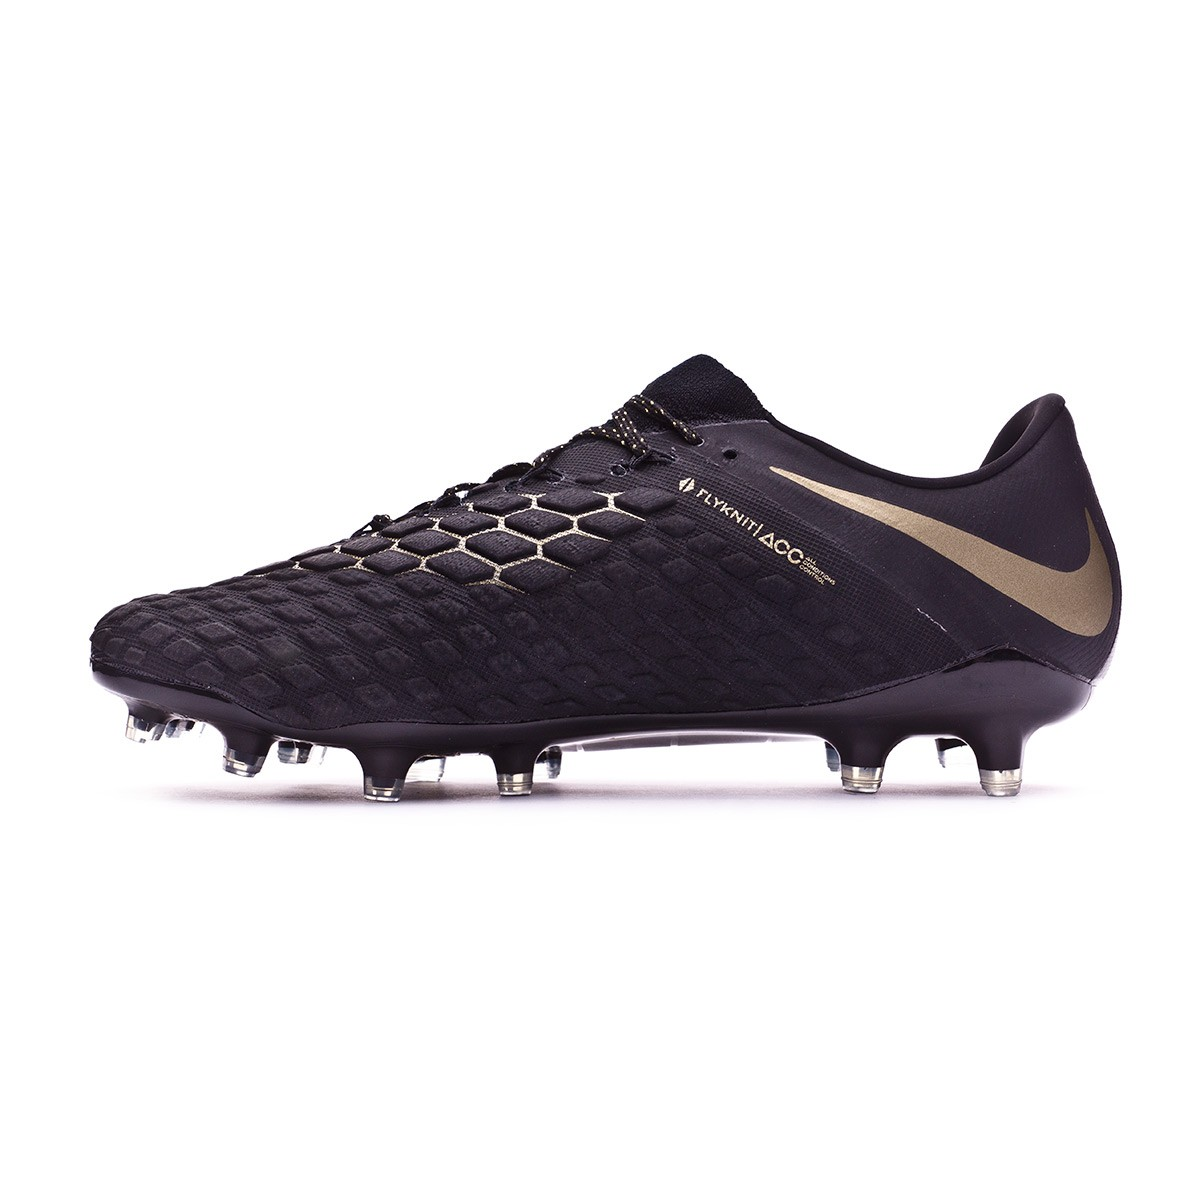 Football Boots Nike Hypervenom Phantom Iii Elite Fg Black